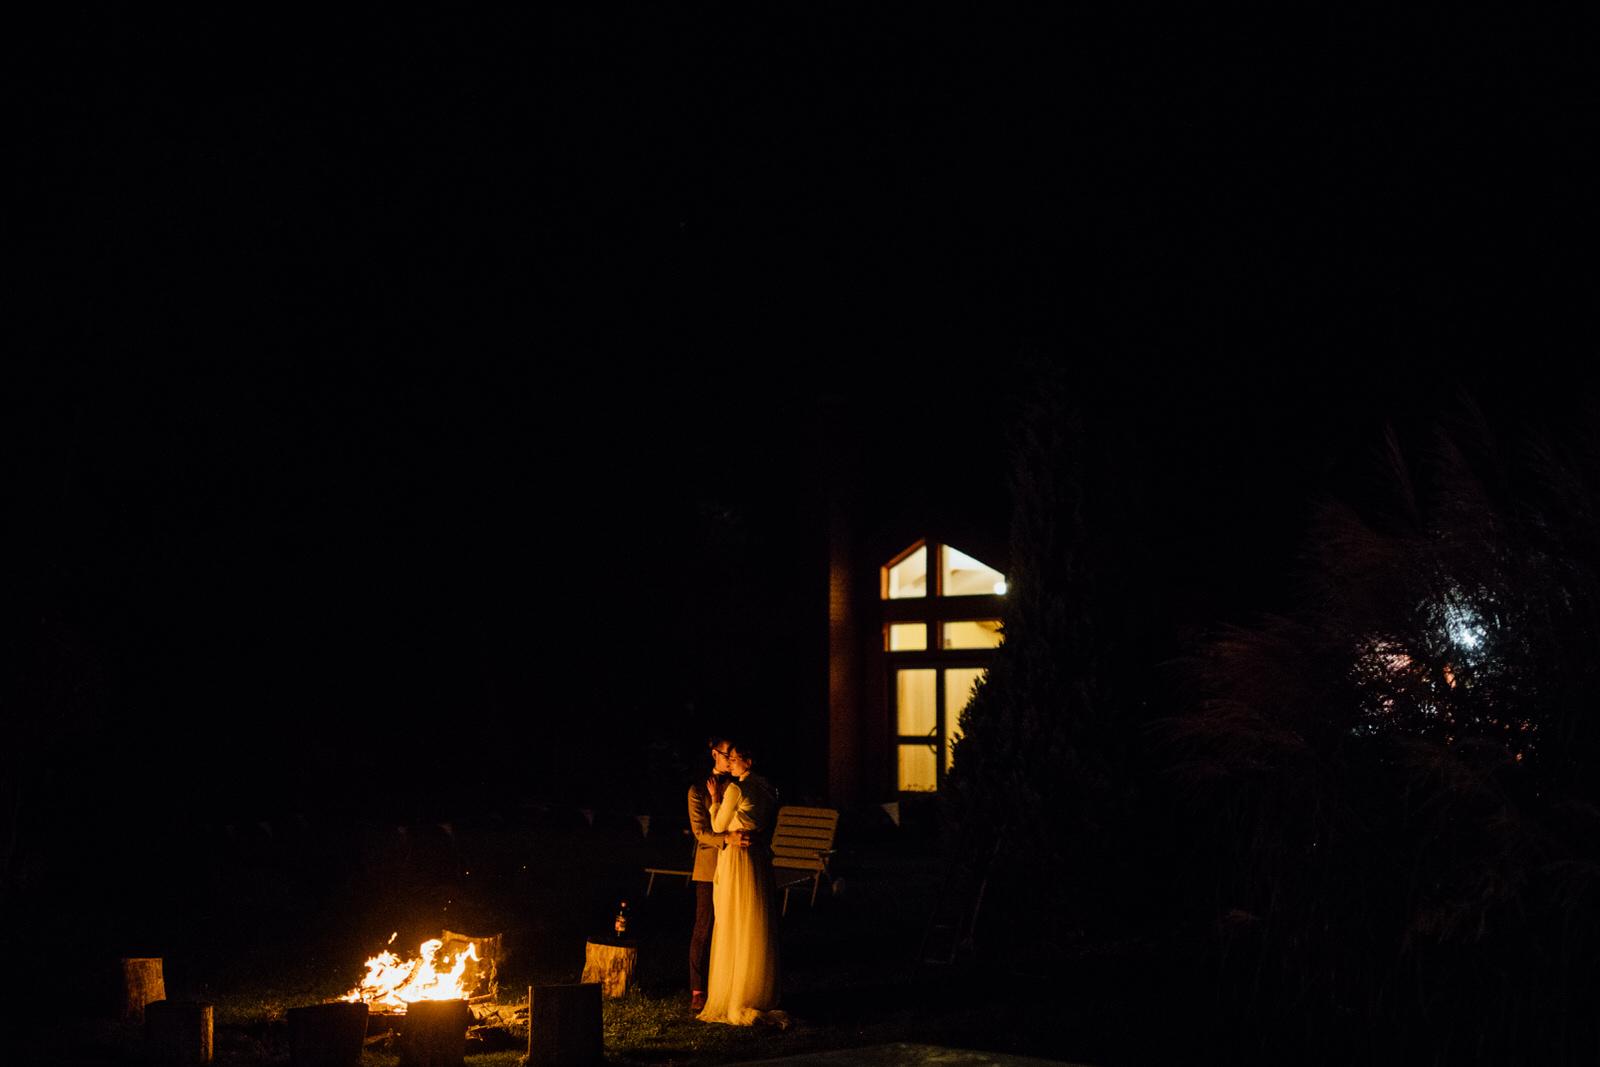 Paul_Traeger_Hochzeitsfotograf_Thueringen_Erfurt_Jena_Weimar_100223420.JPG